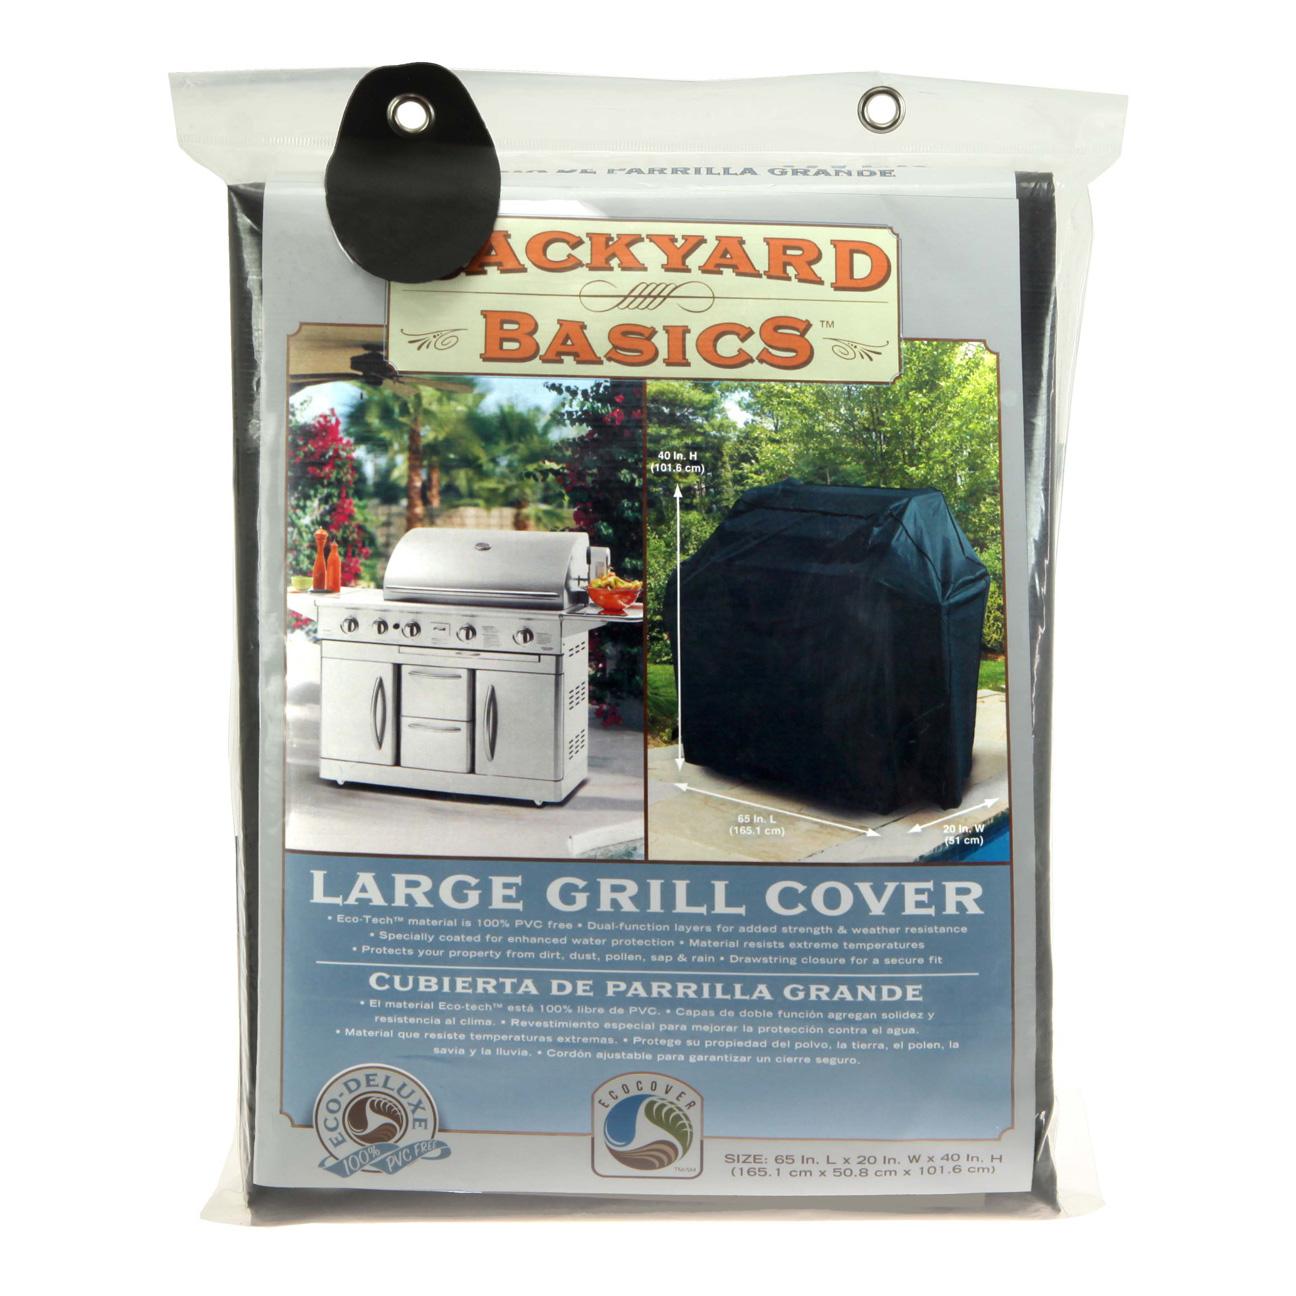 Backyard Basics Grill Cover L